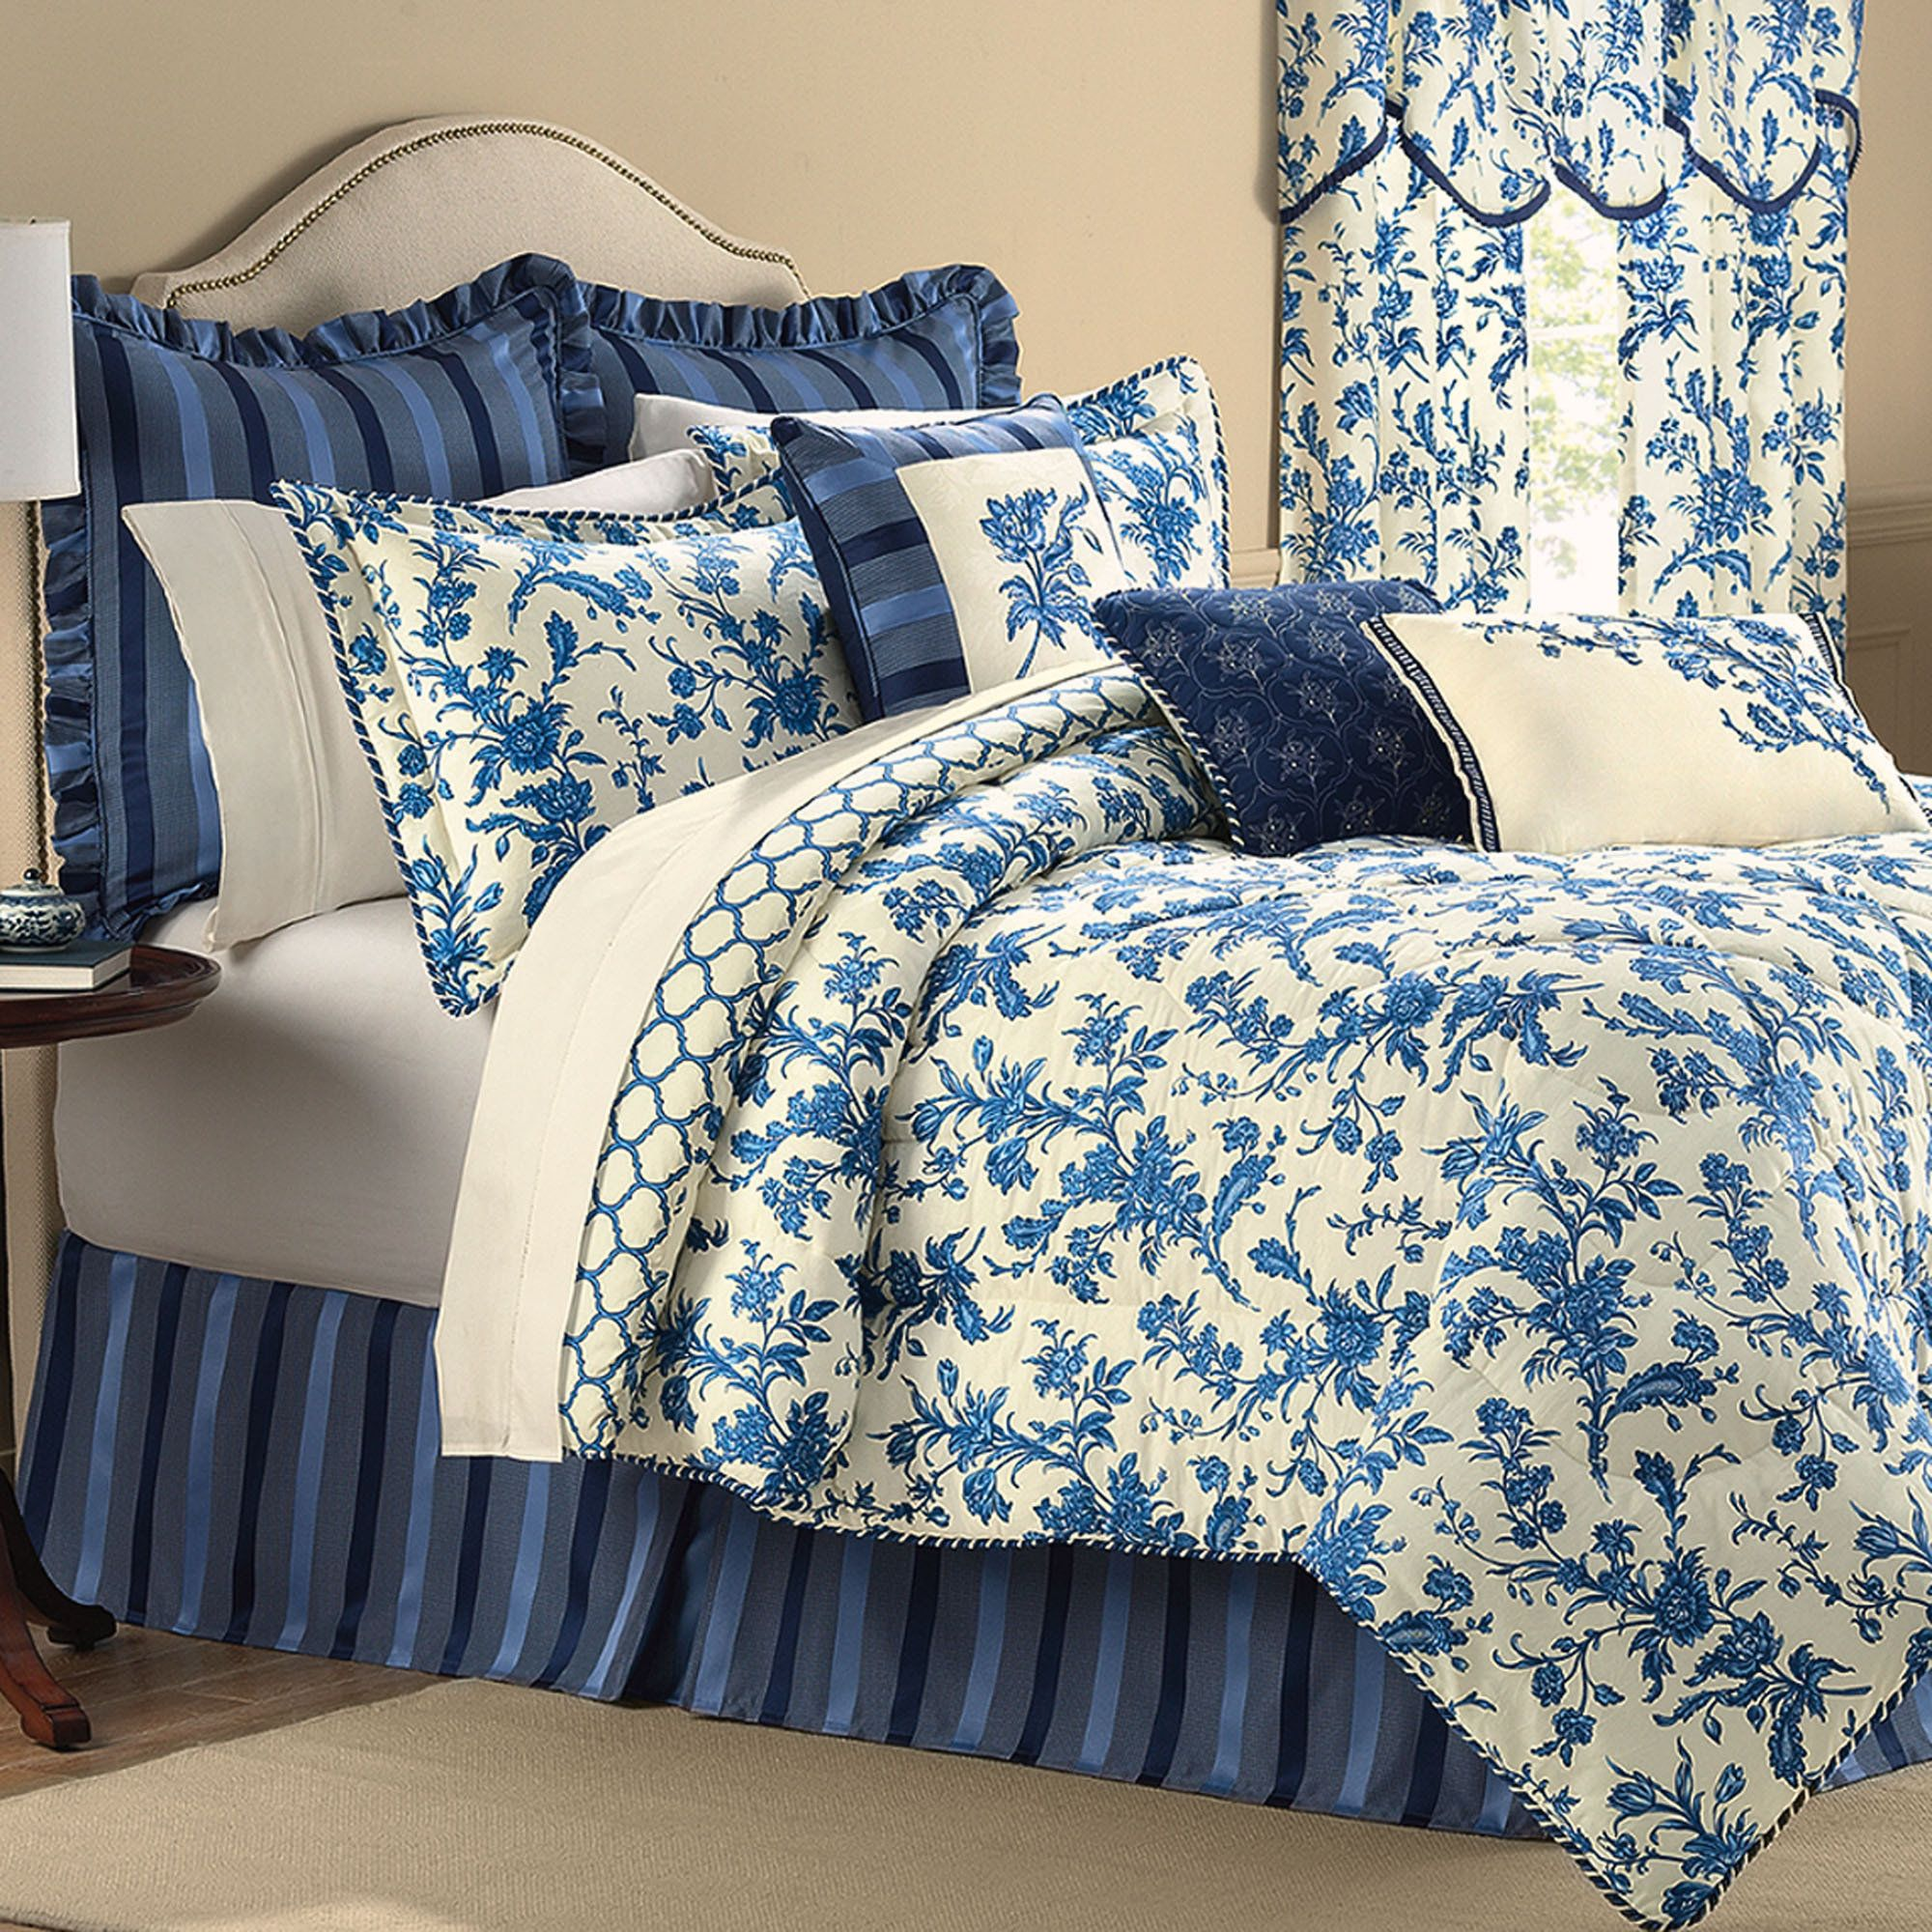 spring flowers comforter bedding  spring flowers comforter and  - spring flowers comforter bedding